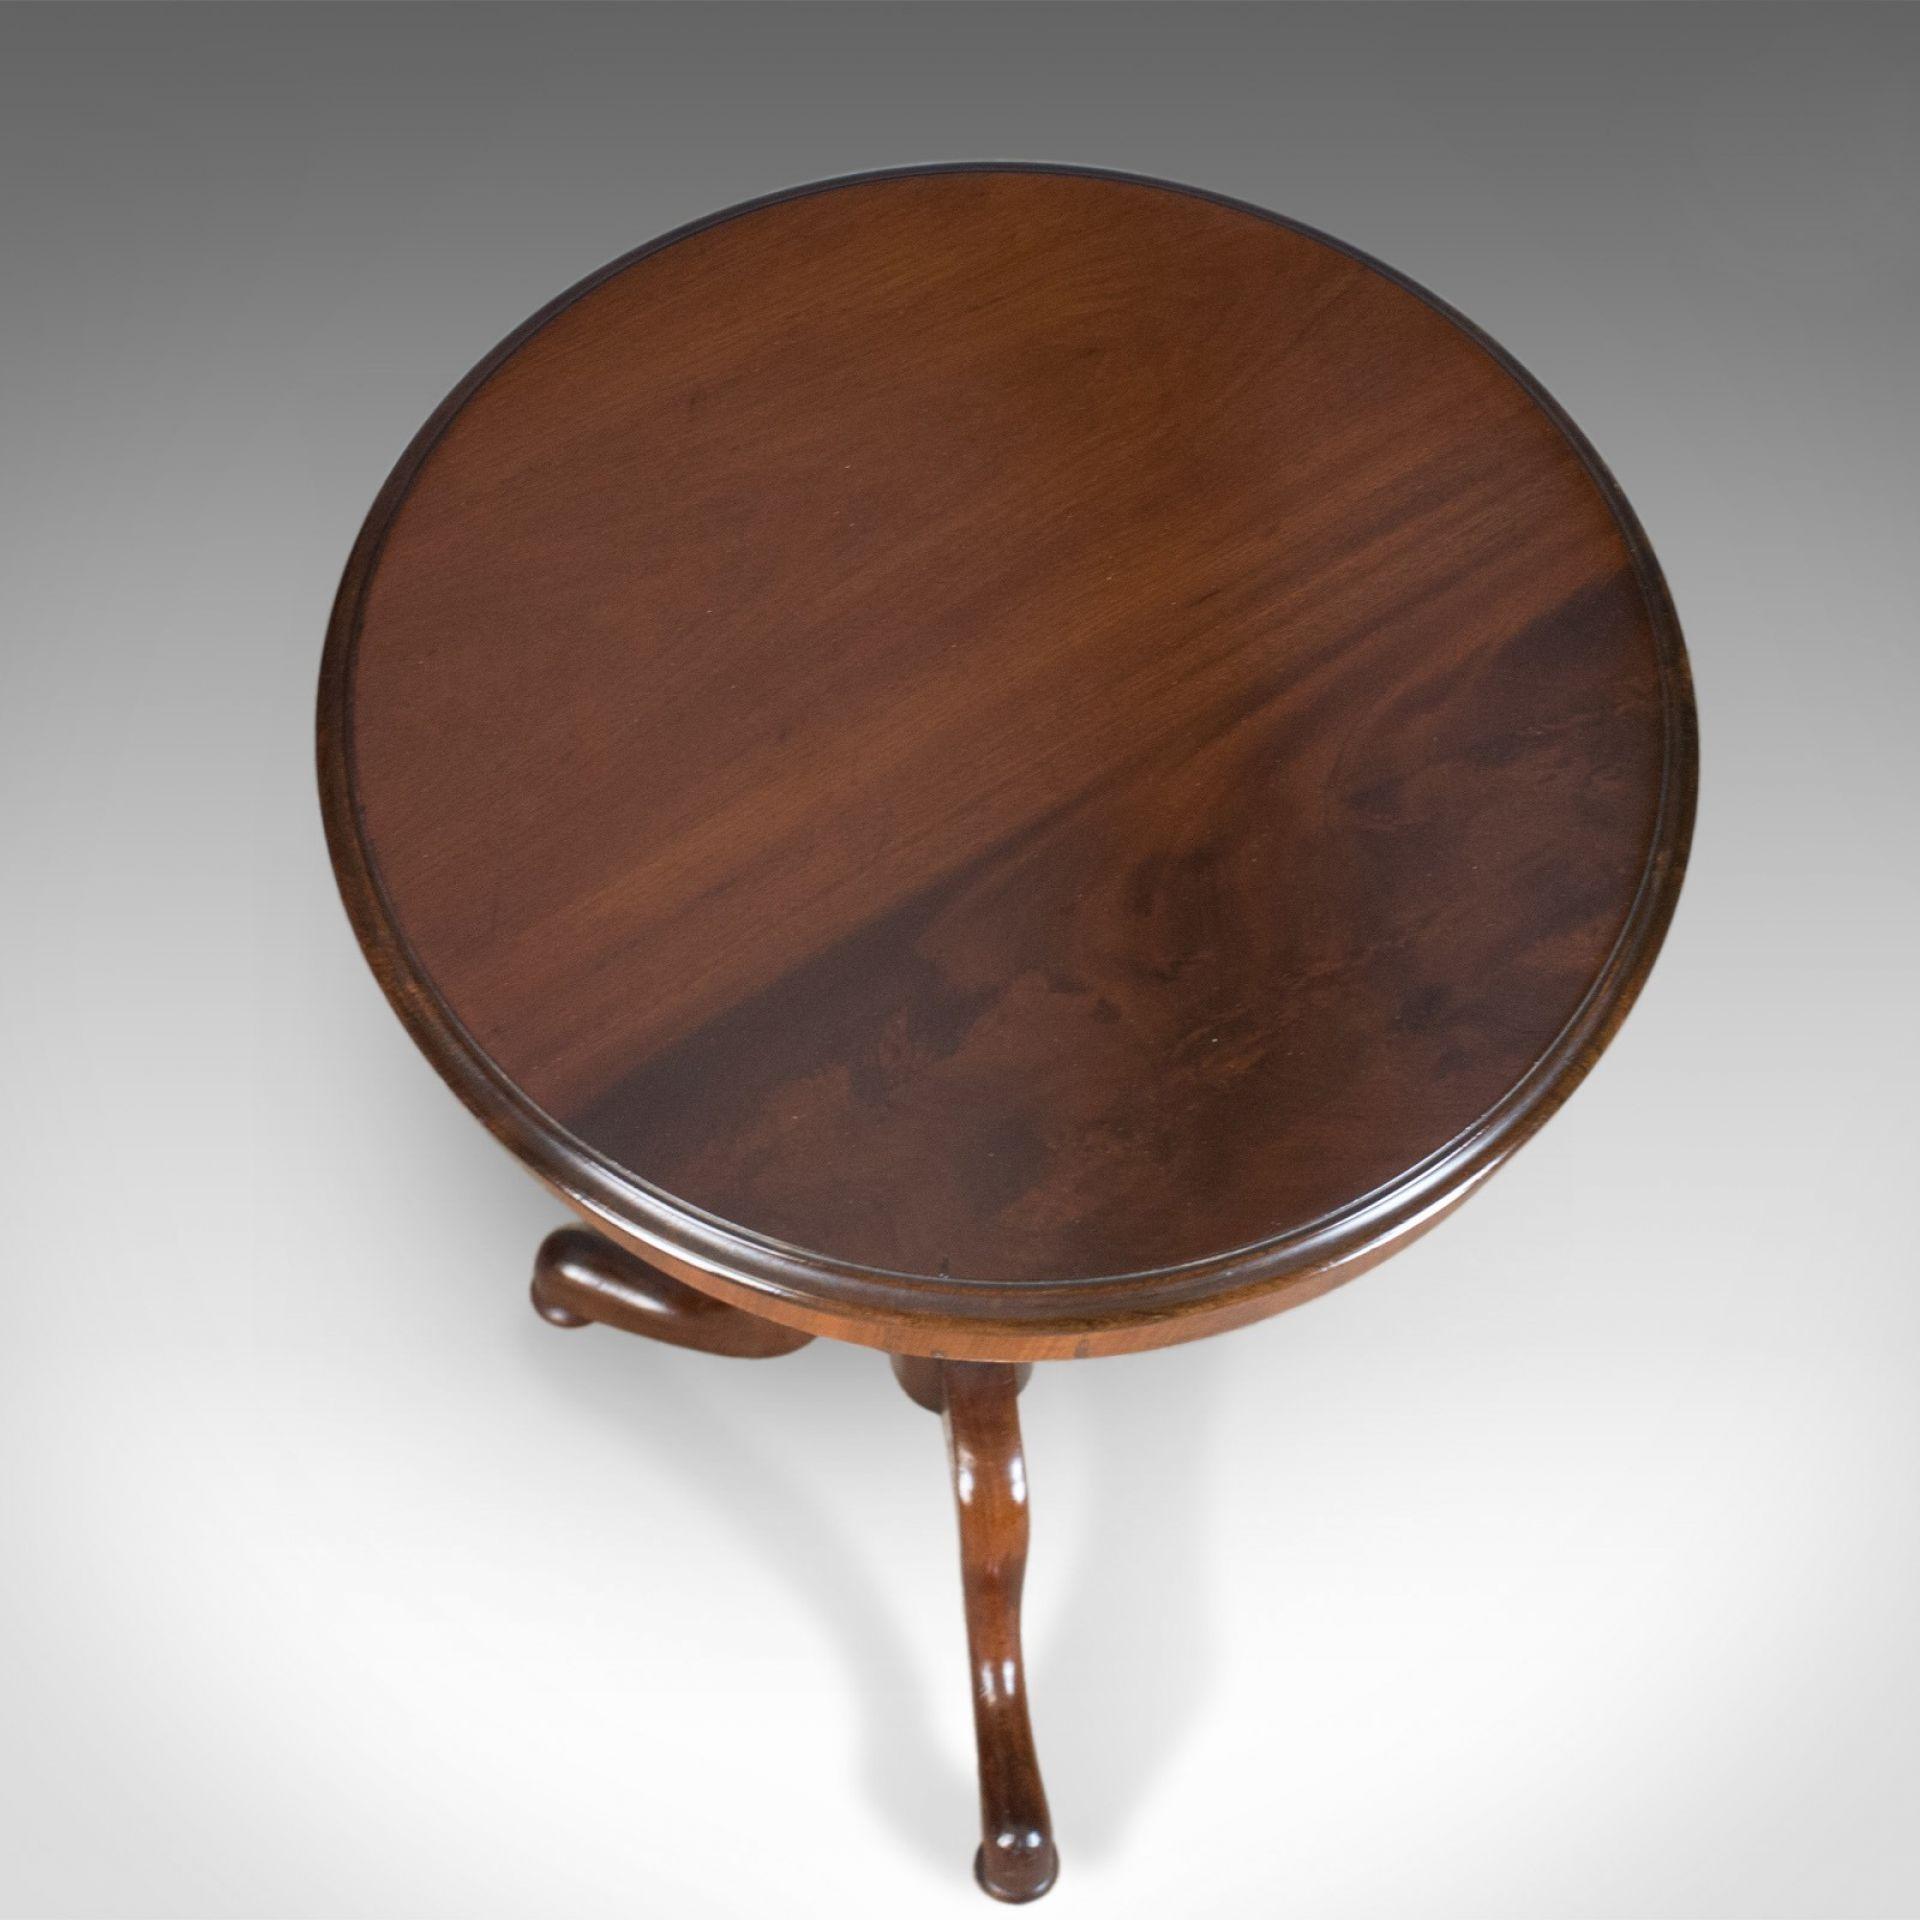 Antique Wine Table, English, Regency, Circular, Side, Mahogany Circa 1830